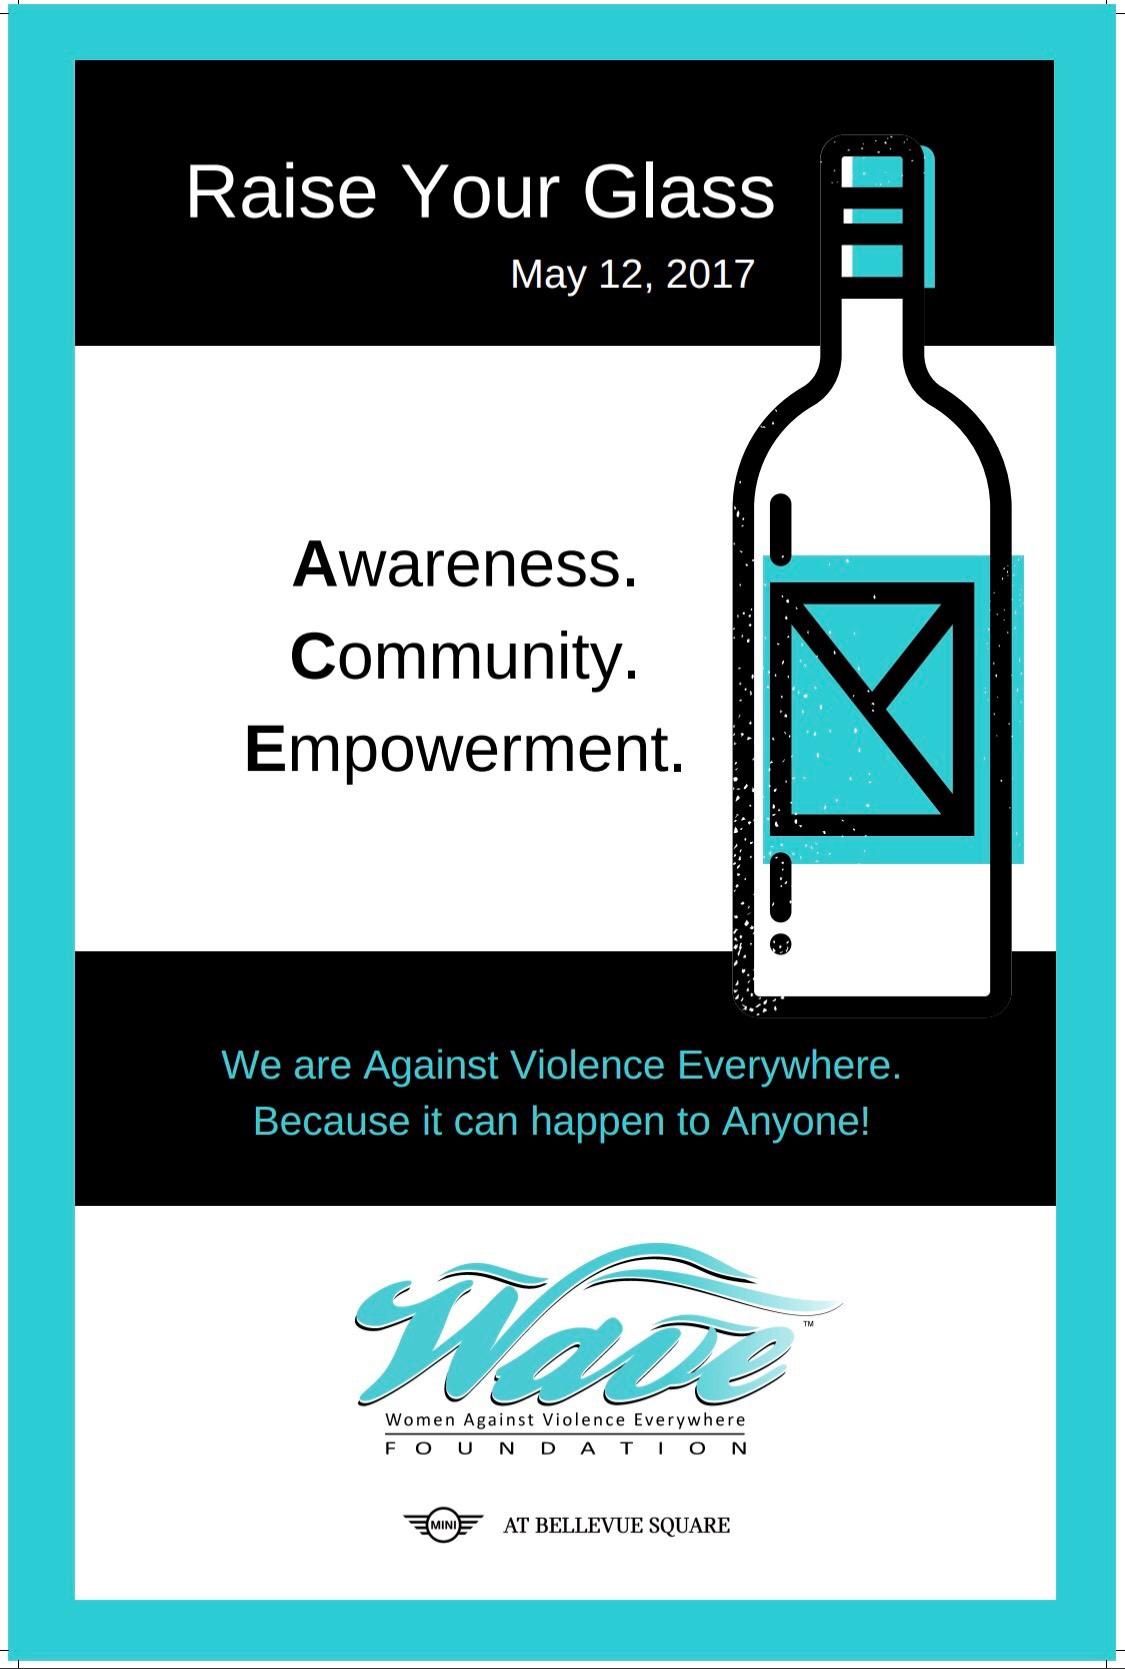 WAVE_RYG_event poster.jpg